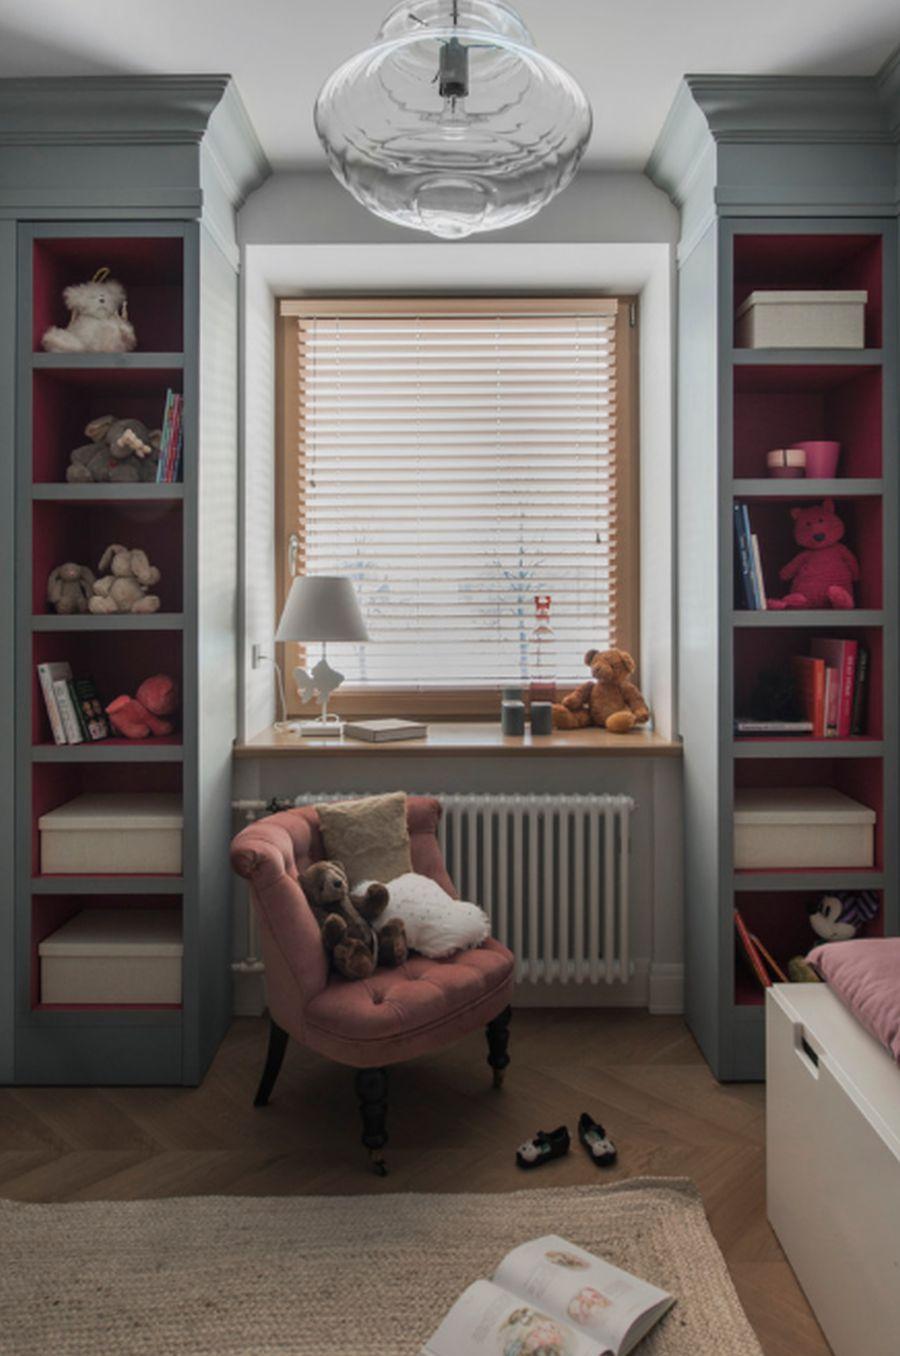 adelaparvu-com-despre-reoganizarea-unui-apartament-de-2-camere-in-3-camere-54-mp-designer-masha-kunyakina-foto-olga-melekesceva-18